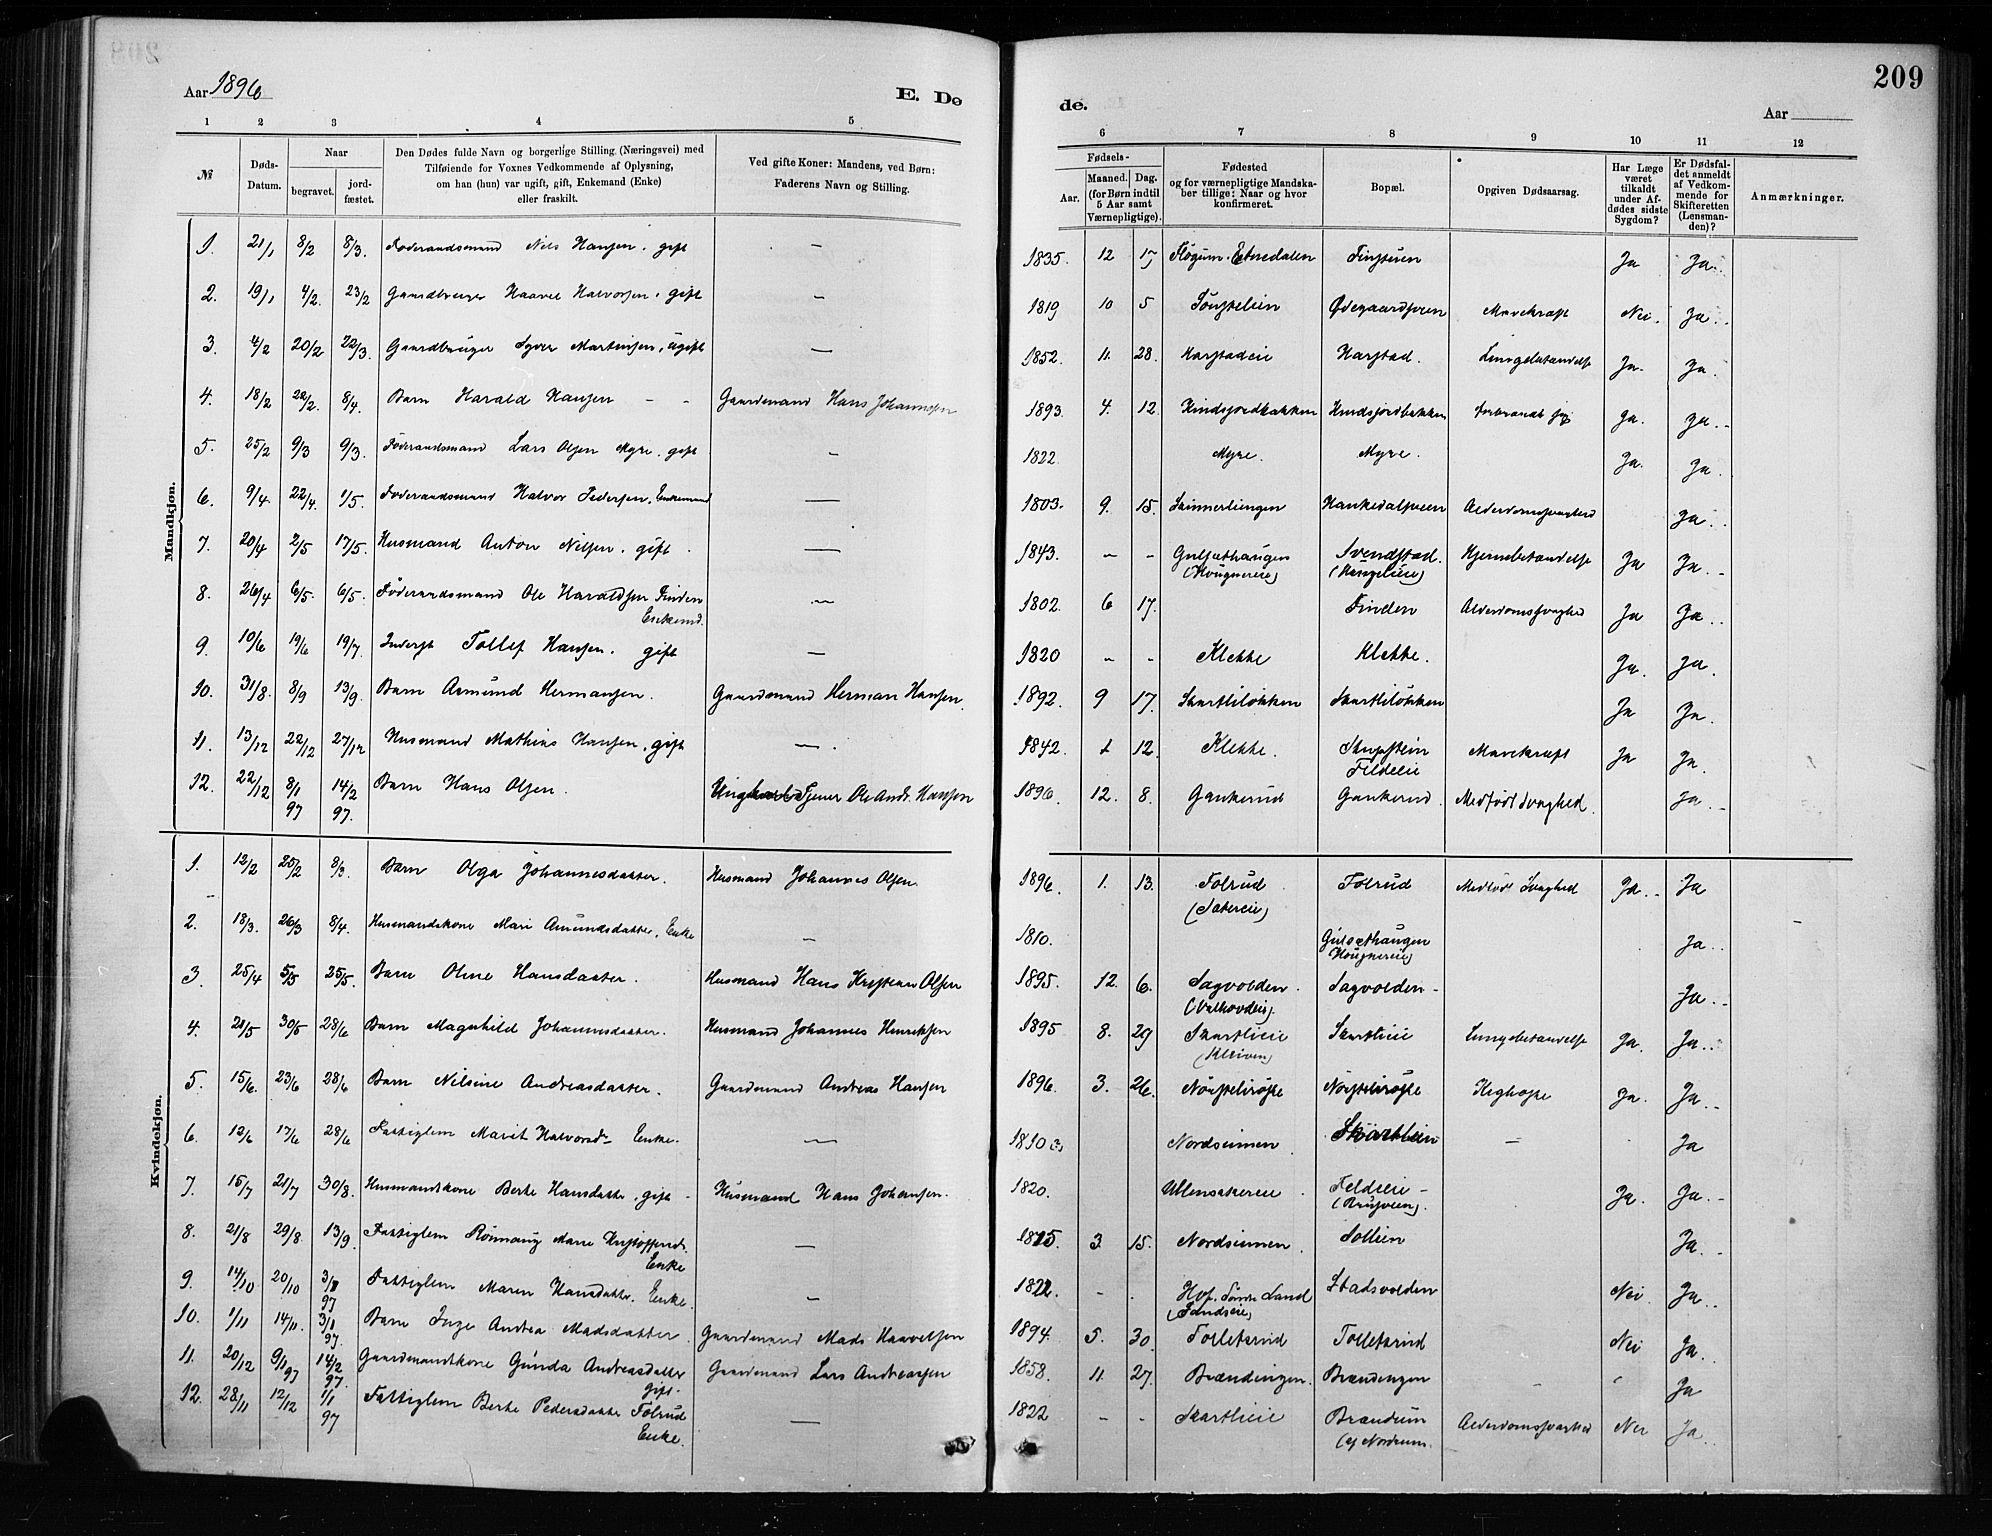 SAH, Nordre Land prestekontor, Ministerialbok nr. 4, 1882-1896, s. 209